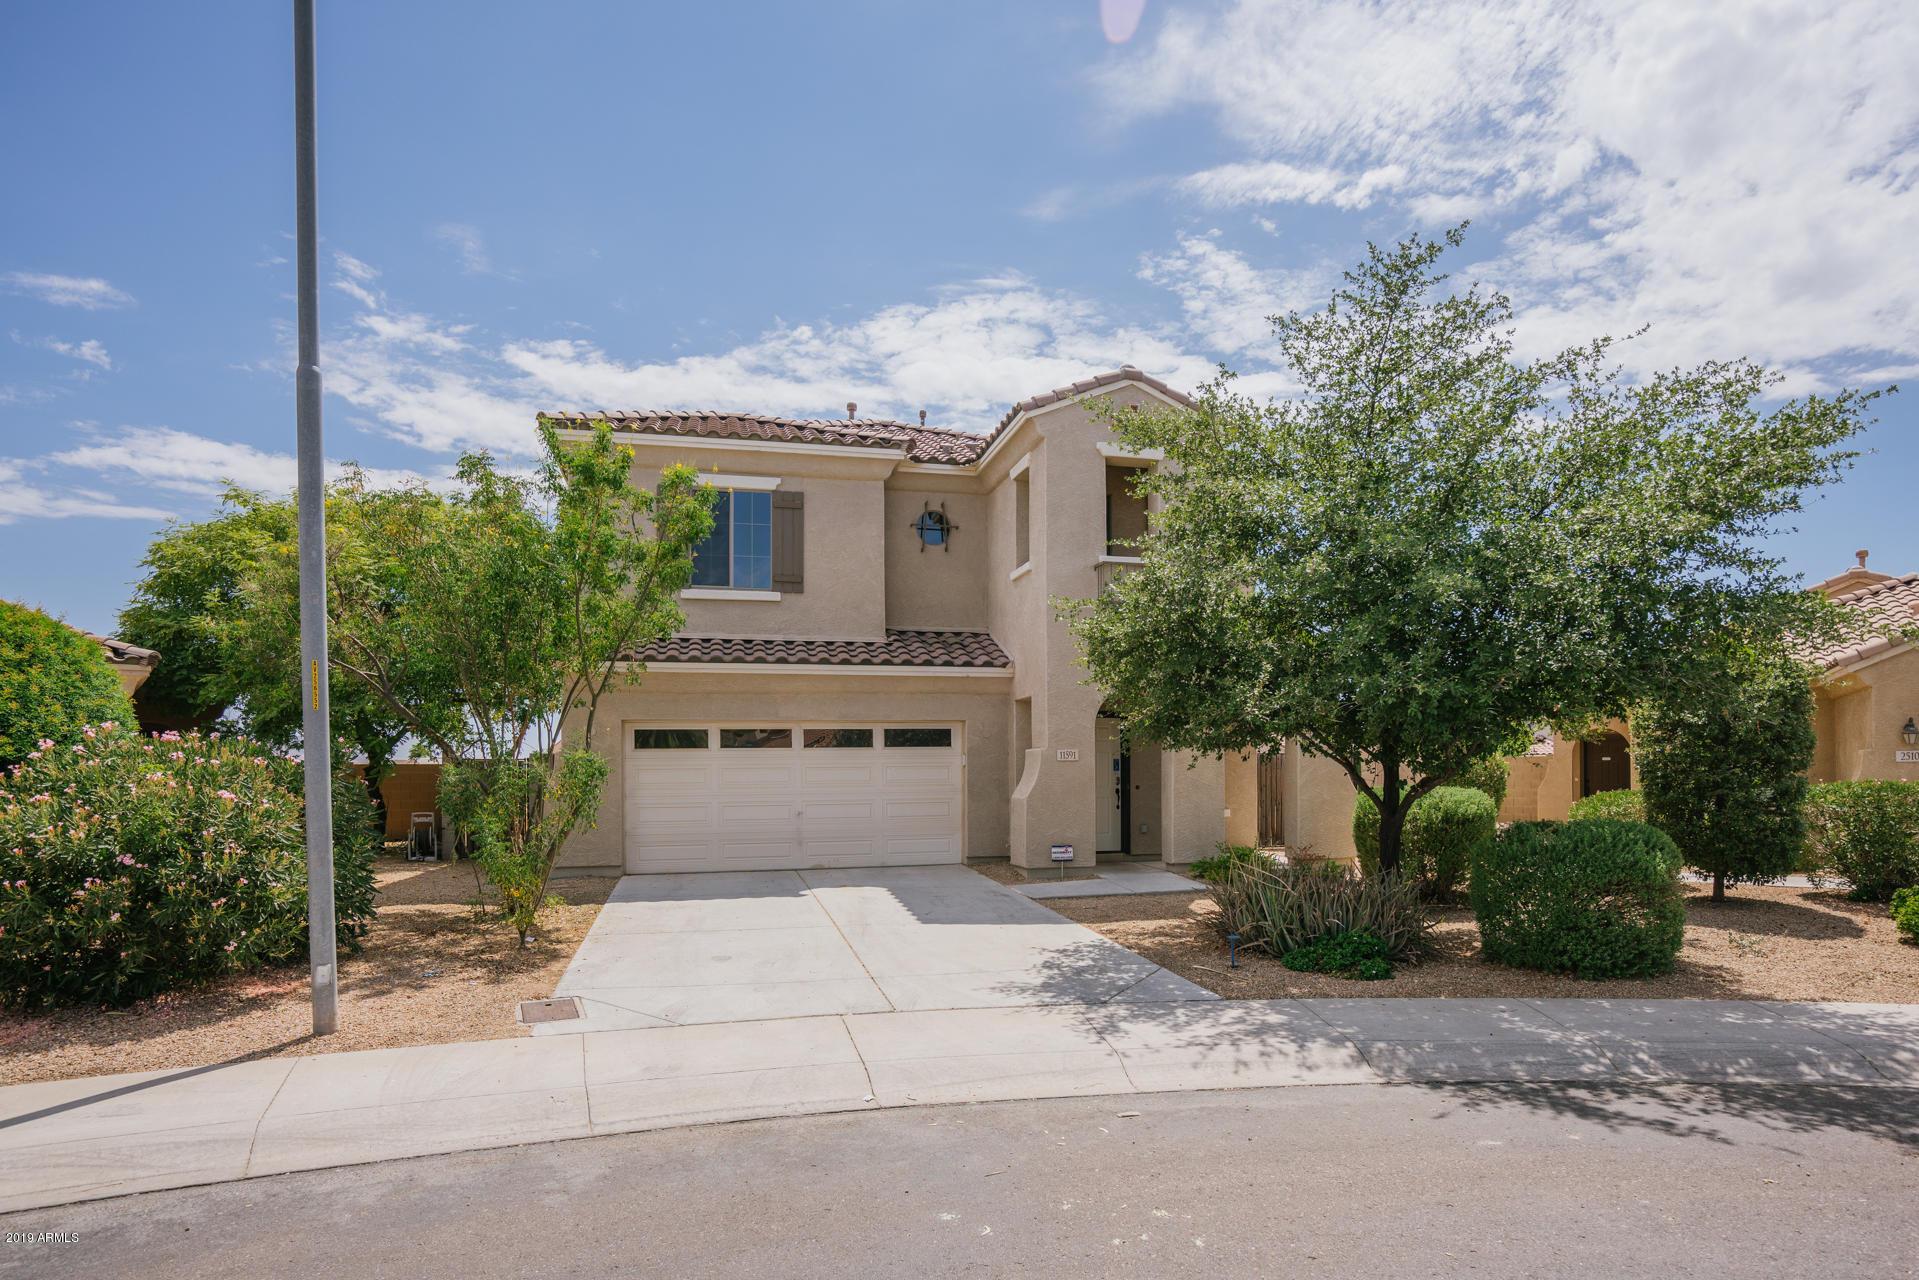 Photo of 11591 W RIO VISTA Lane, Avondale, AZ 85323